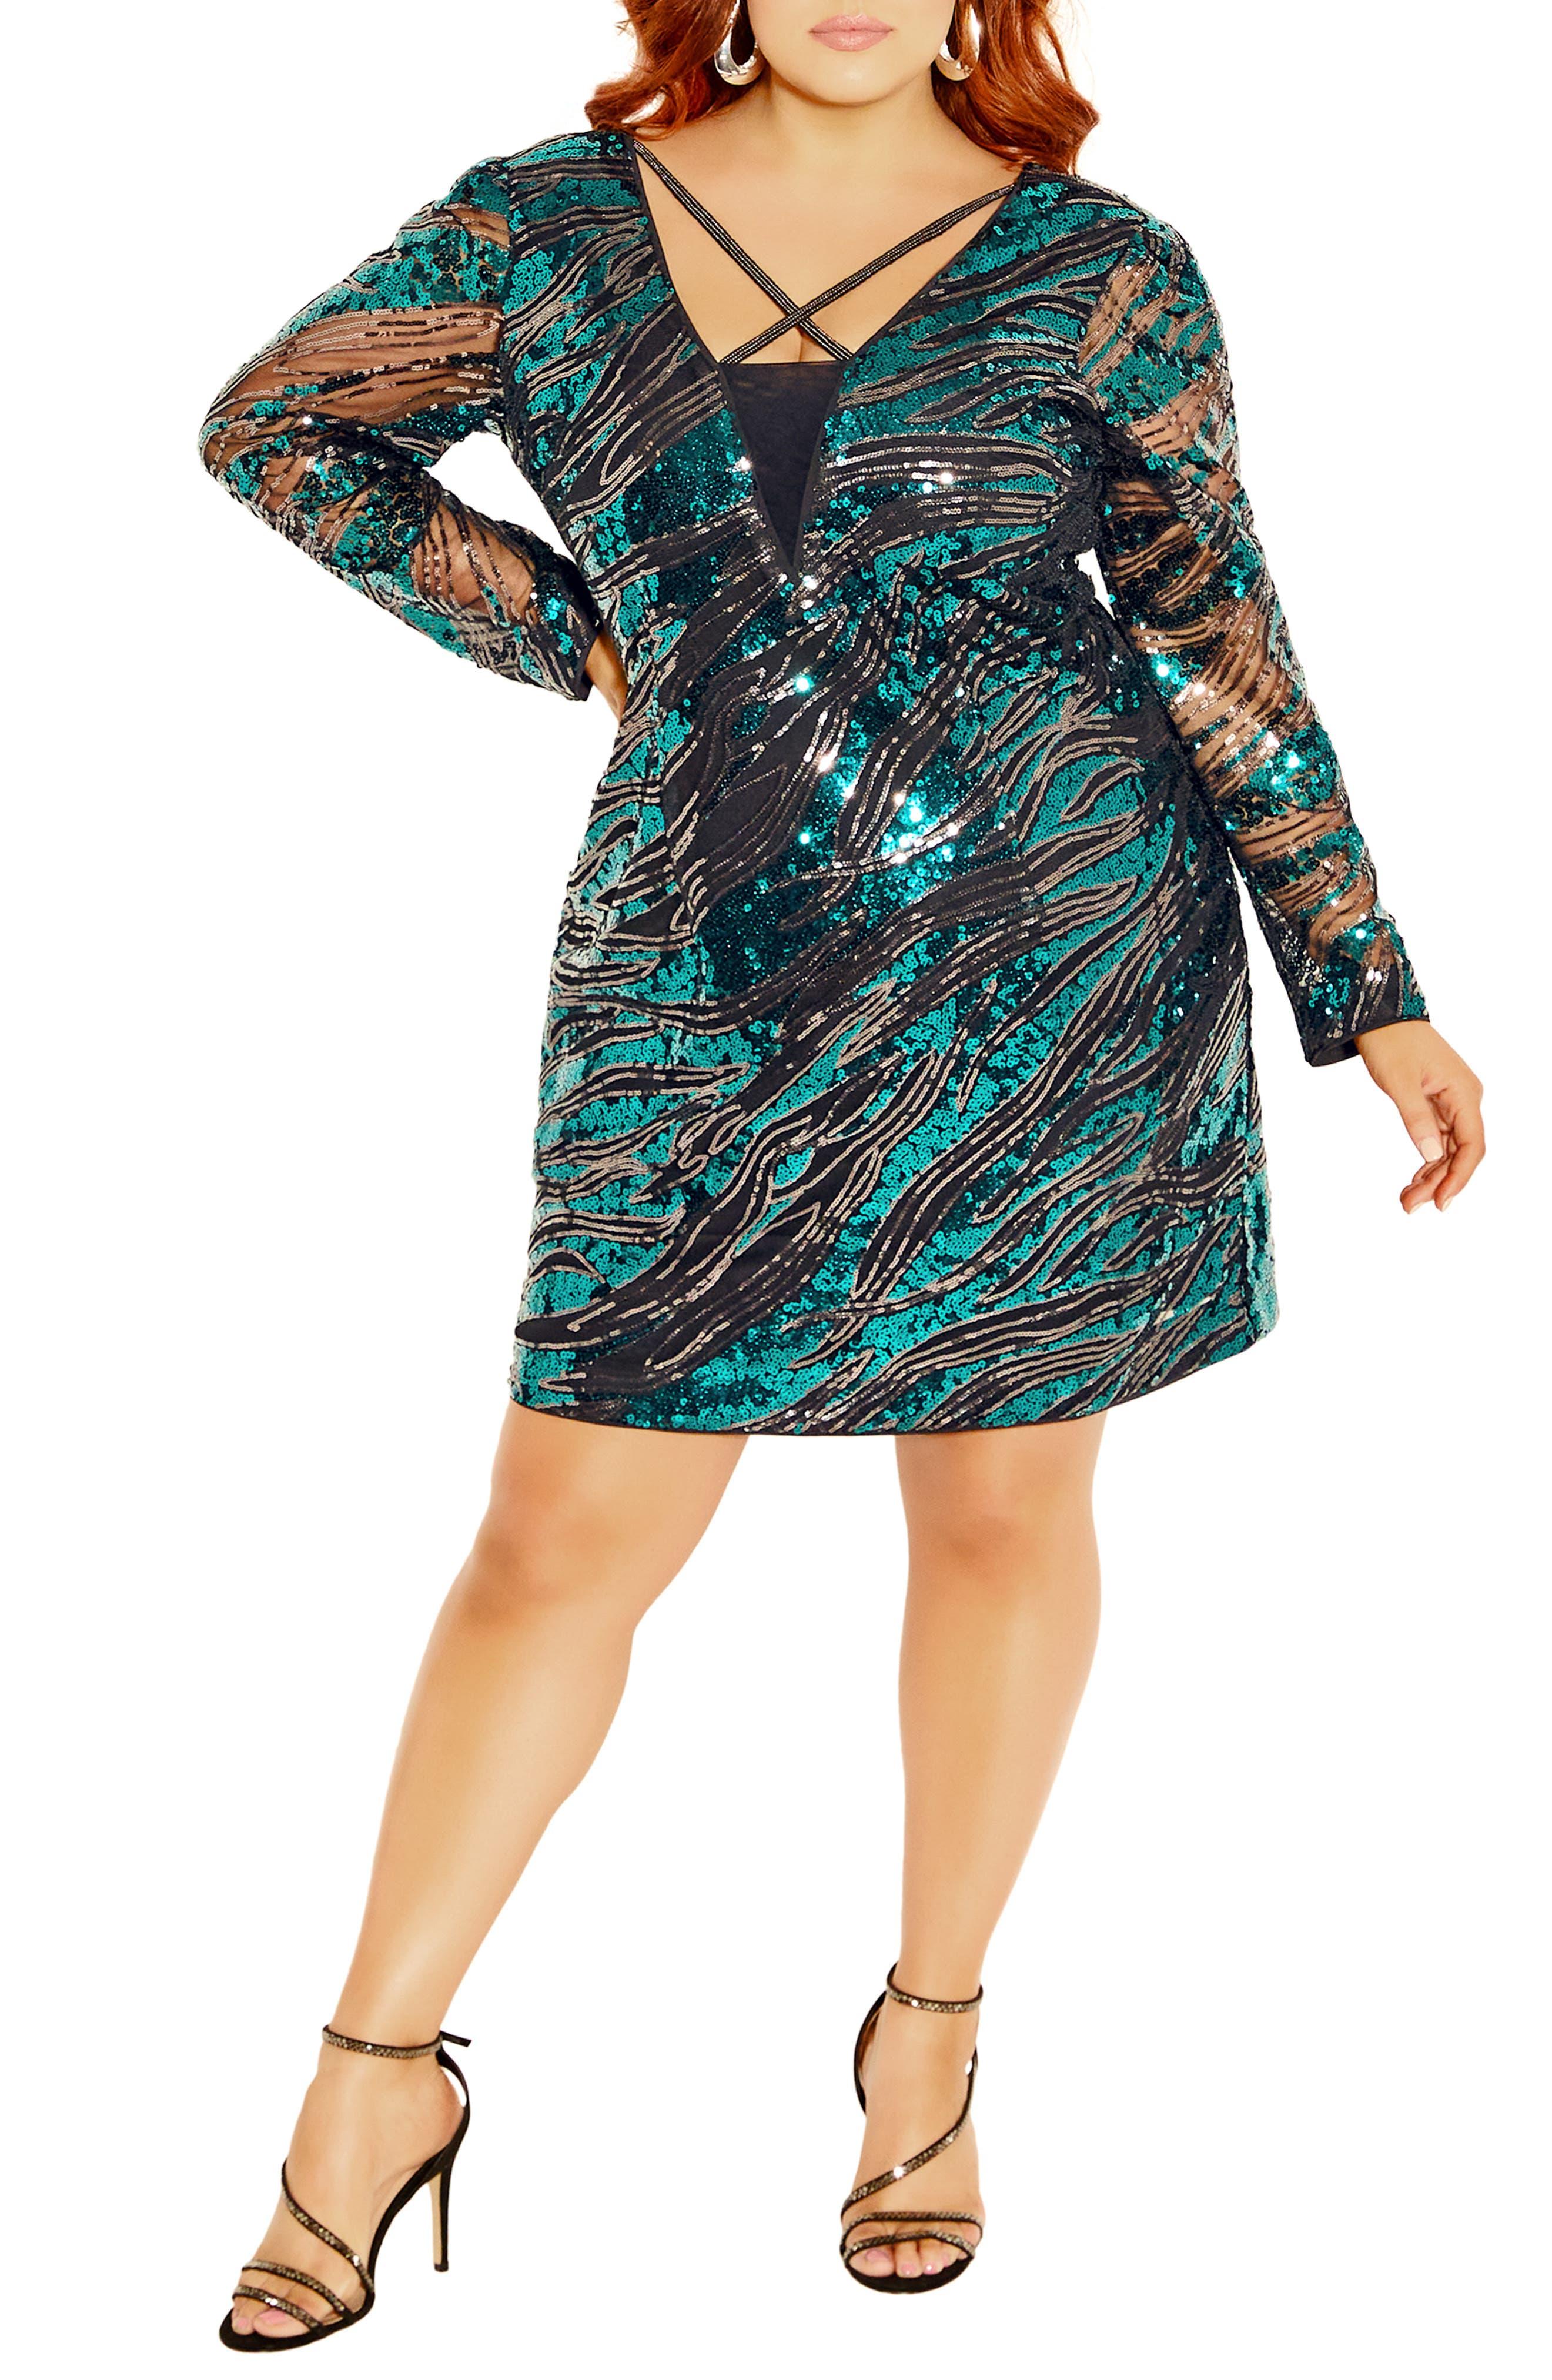 Divinity Sequin Long Sleeve Dress